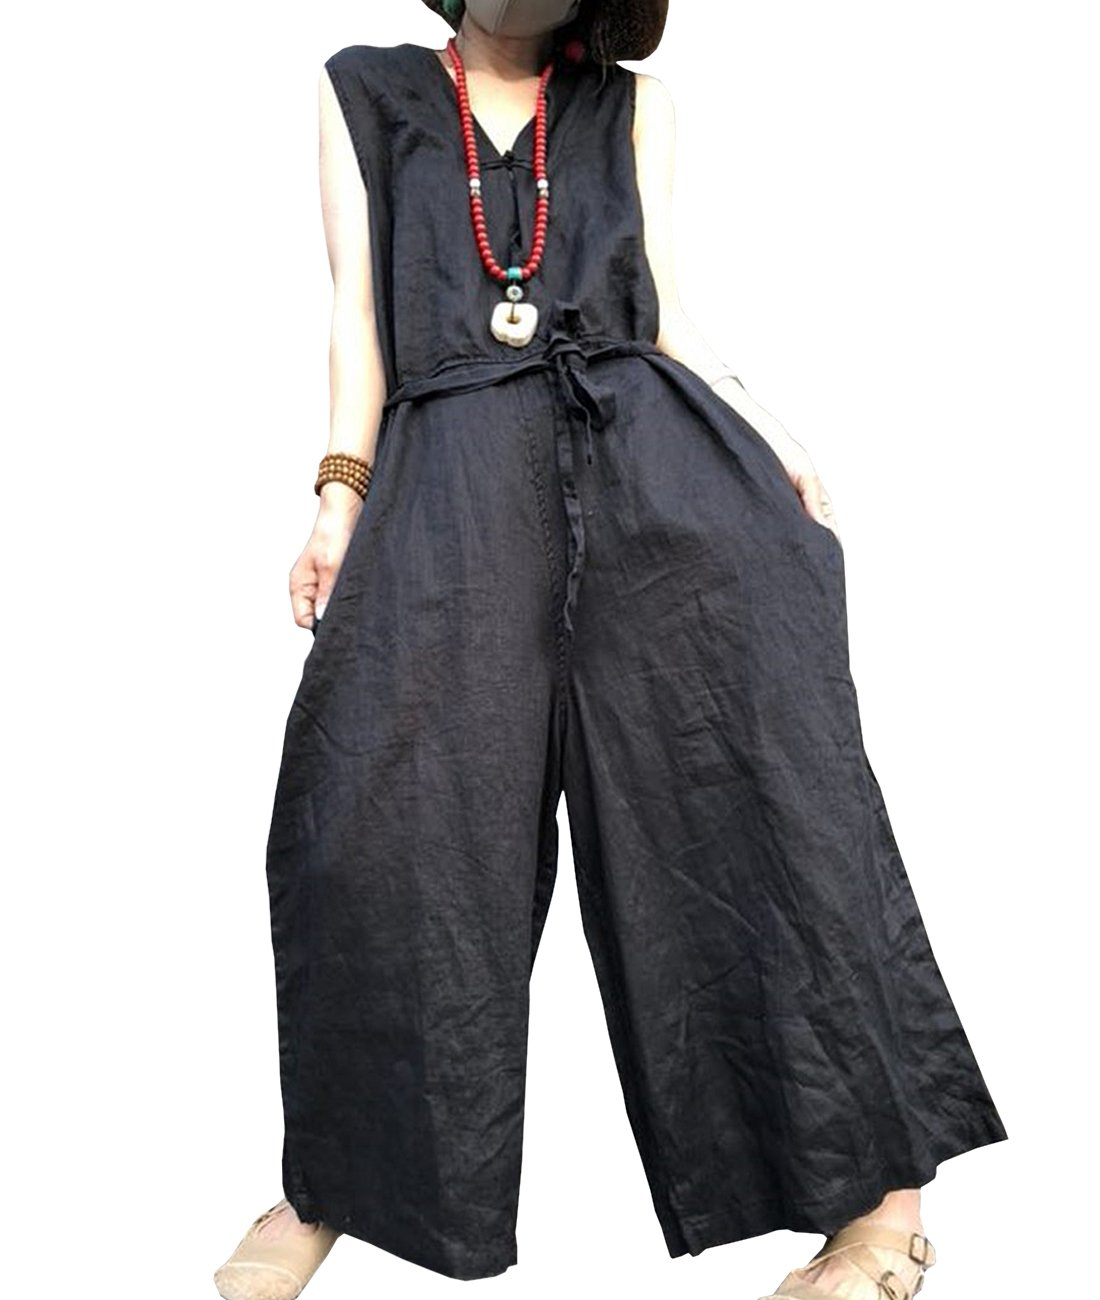 YESNO p91レディースオーバーオールジャンプスーツ100 %コットンカジュアル刺繍Distressed Boyfriend Wide Leg B07F2WWYXZ Medium|Pl3 Black Pl3 Black Medium